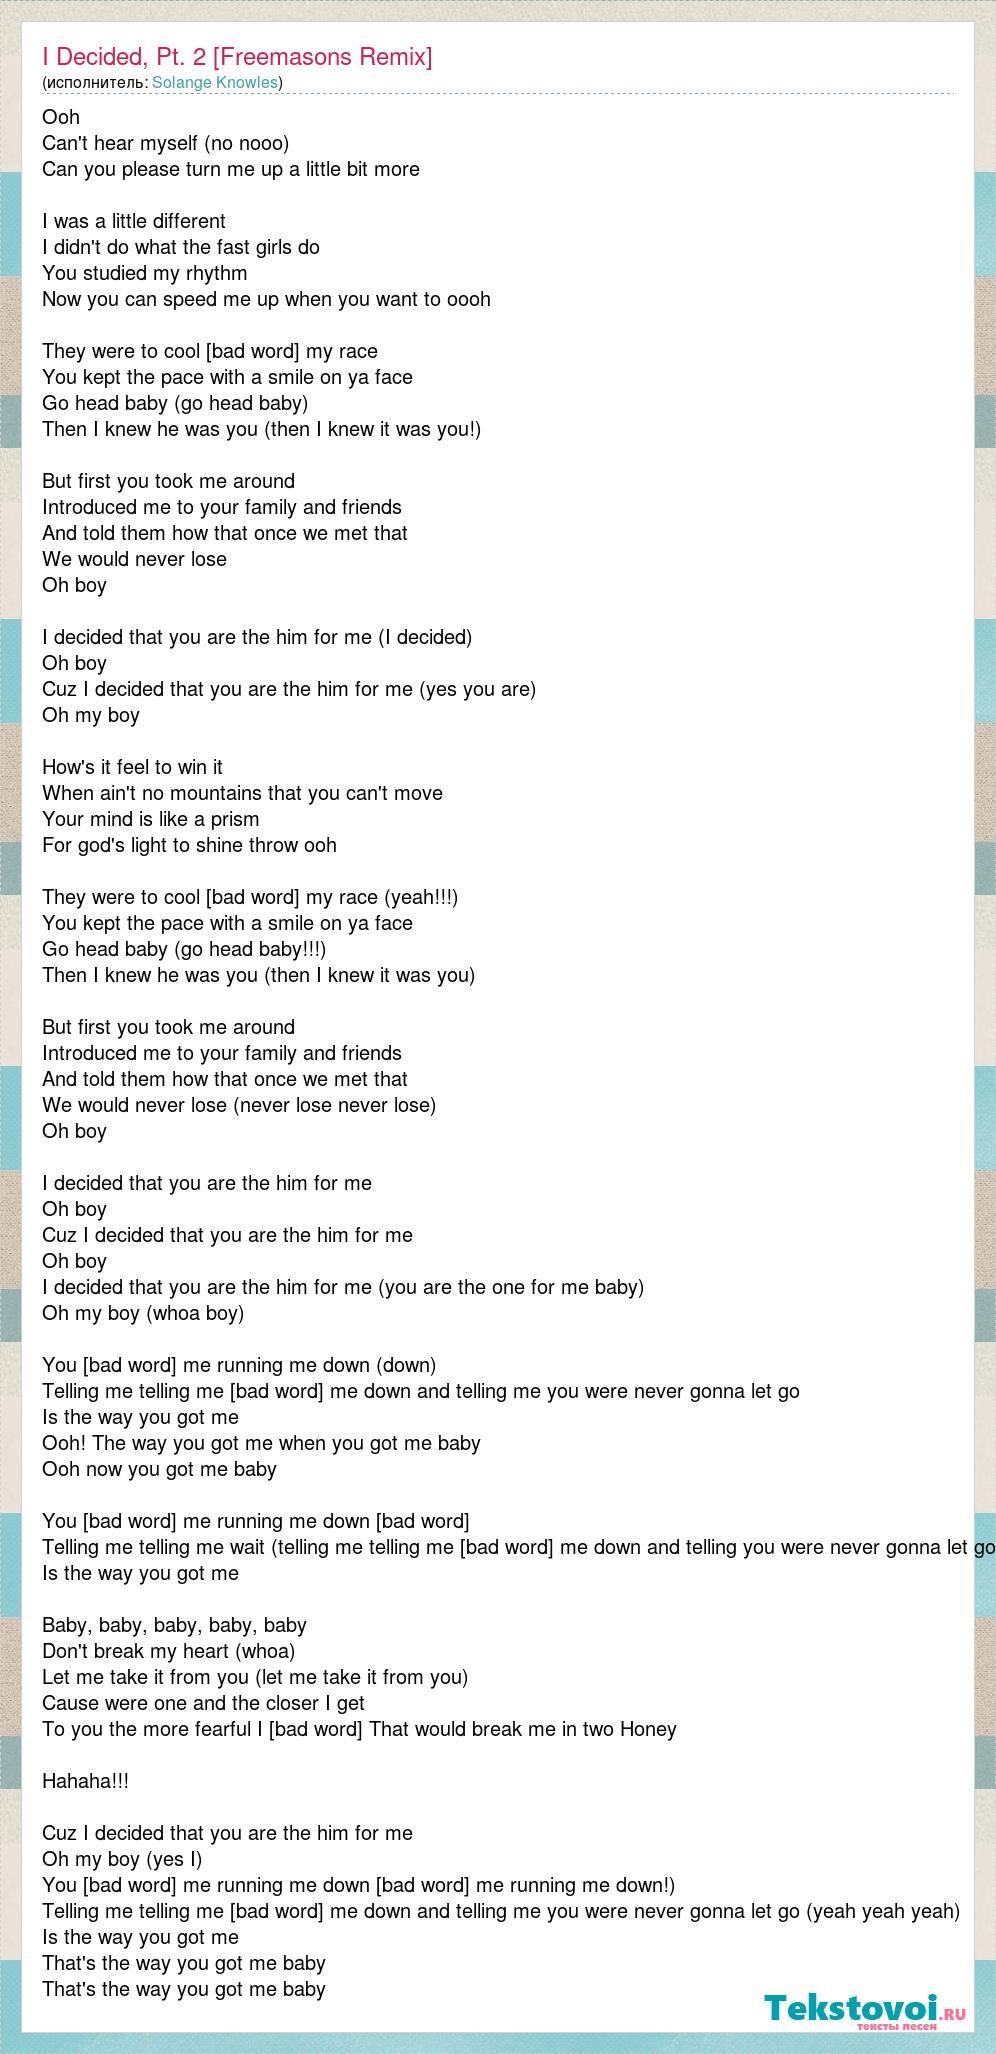 Solange Knowles: I Decided, Pt  2 [Freemasons Remix] слова песни